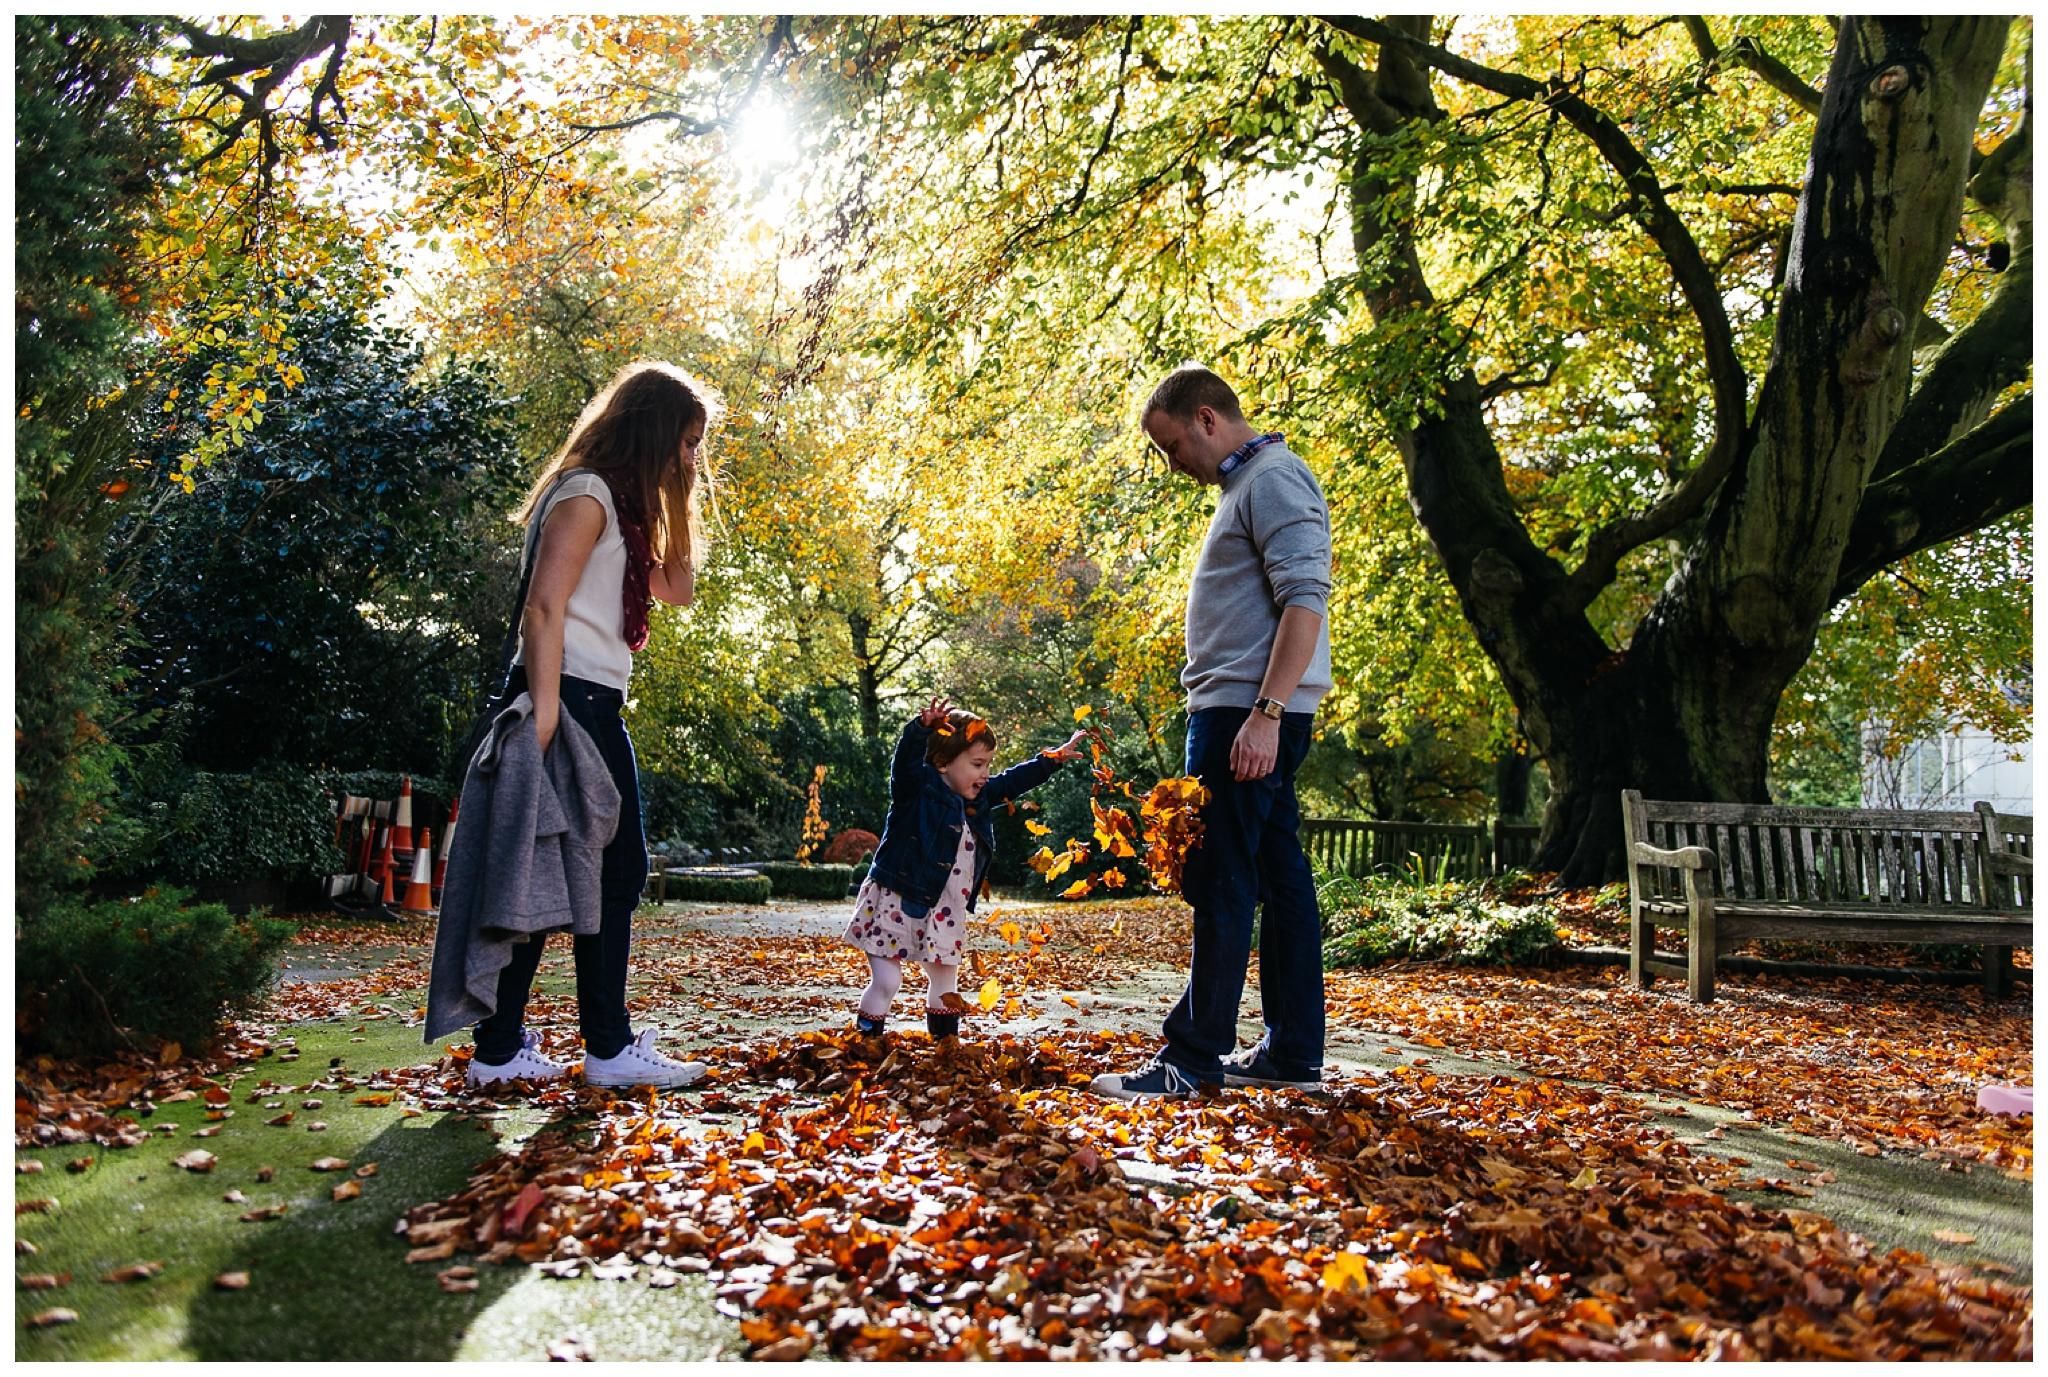 Autumn-family-portraits-birmingham-photographer_0019.jpg